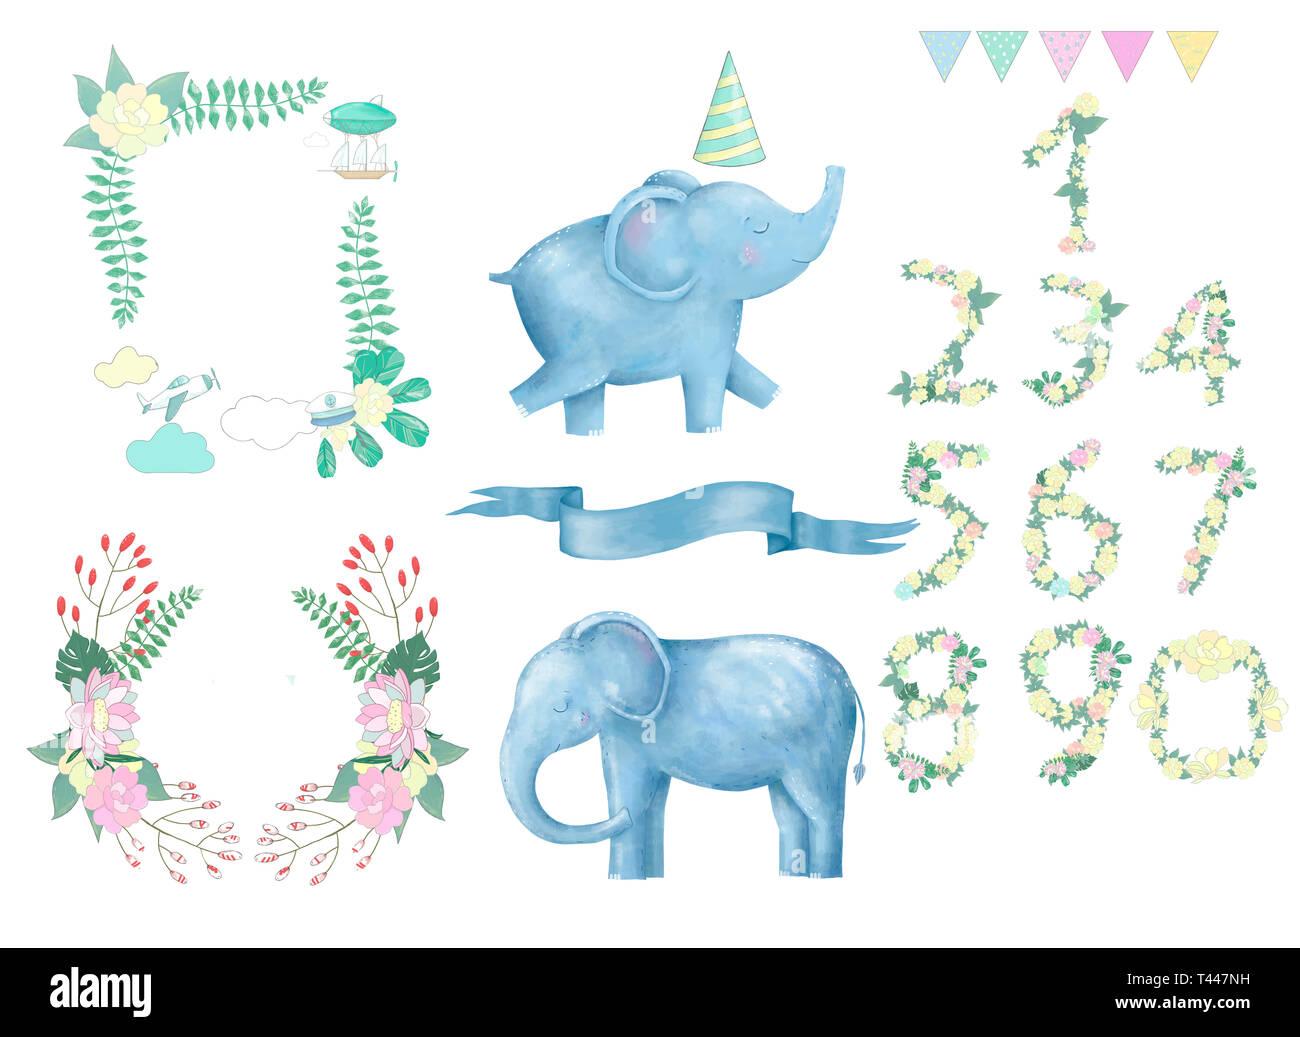 Elephant clip art digital animal drawing watercolor - Stock Image